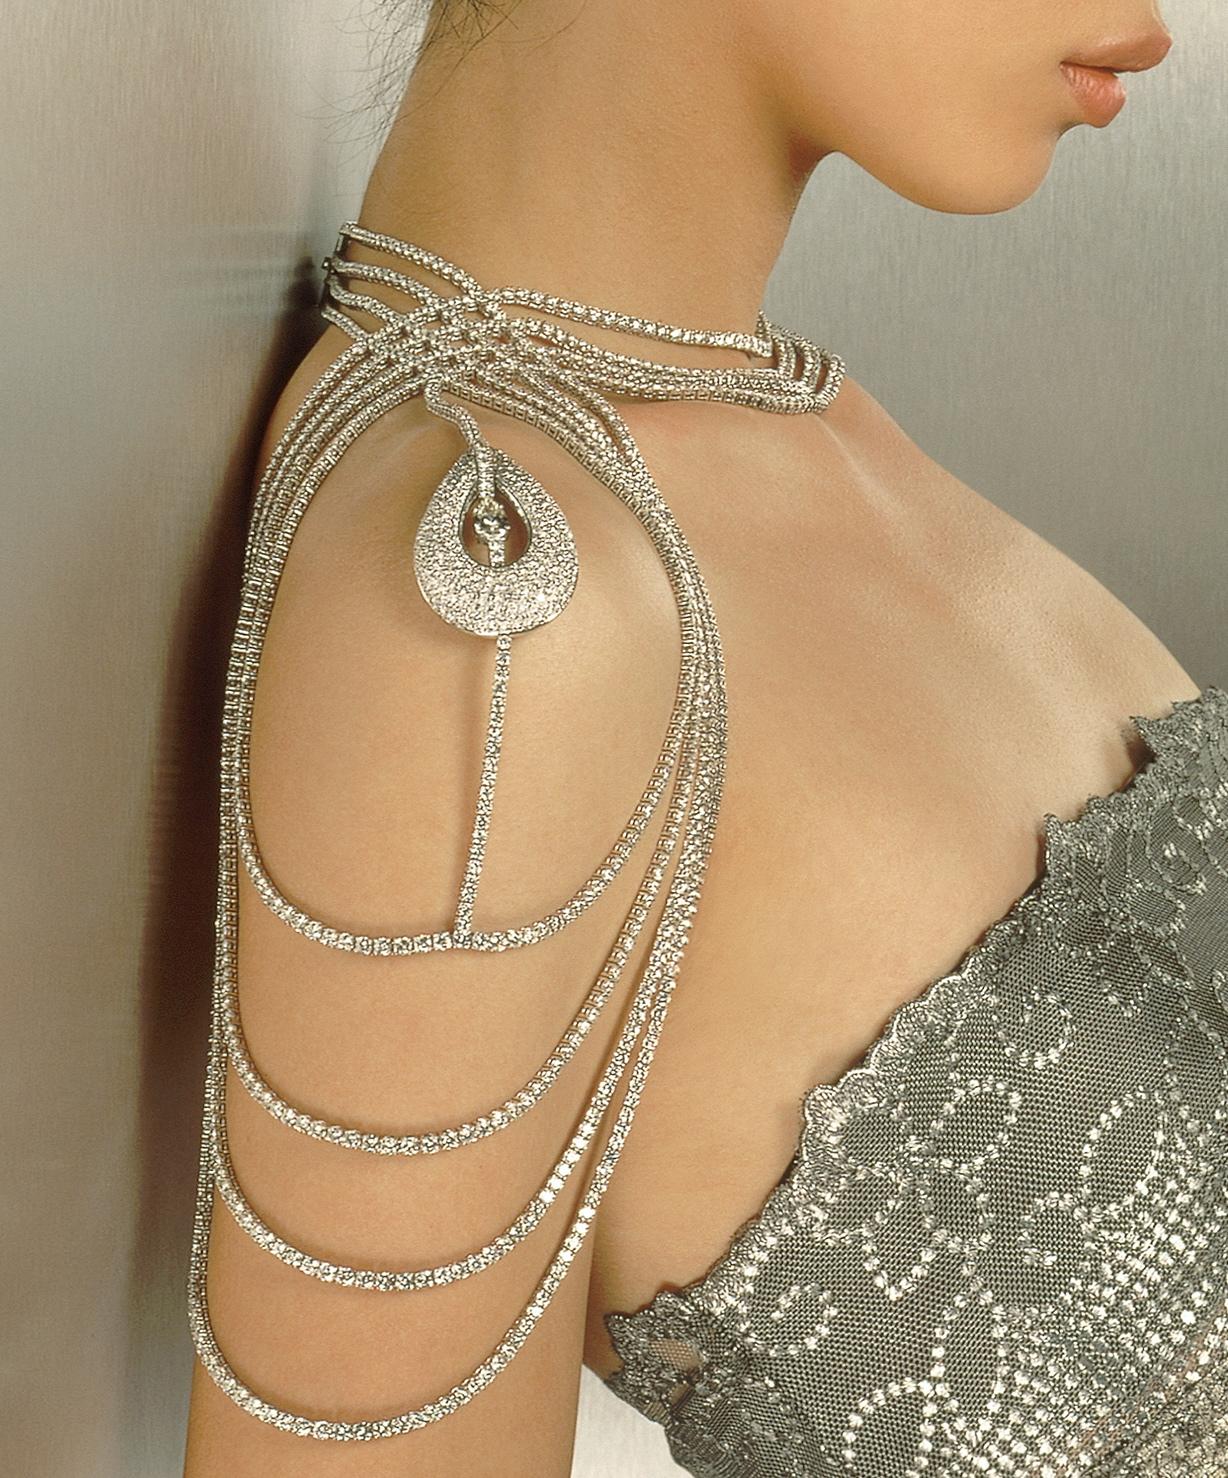 Reena Ahluwalia_Sensuous_De Beers Diamonds-International Awards 2000_photo Albert Watson1.jpg